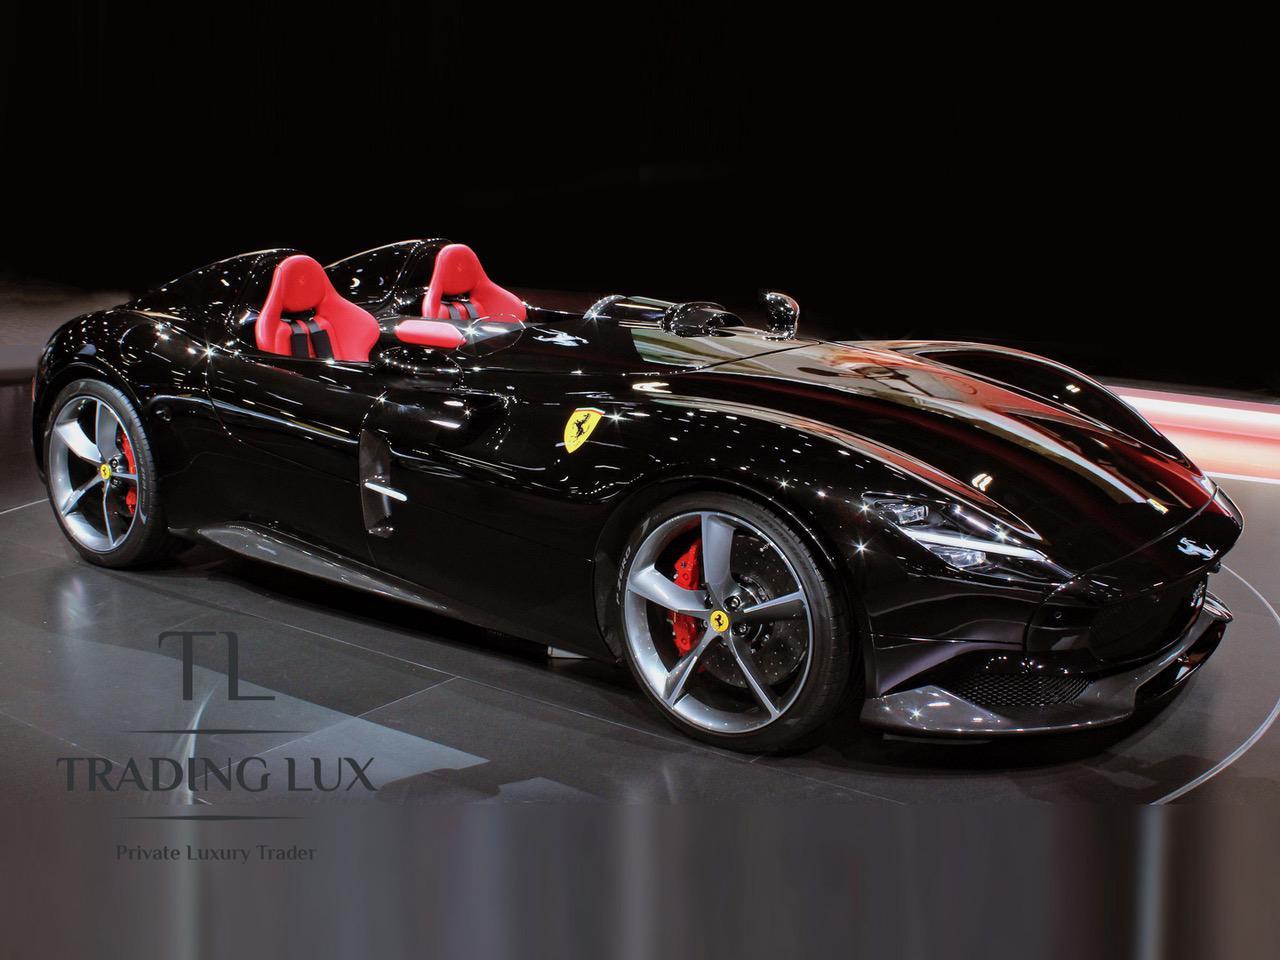 Ferrari Monza Sp2 Tradinglux